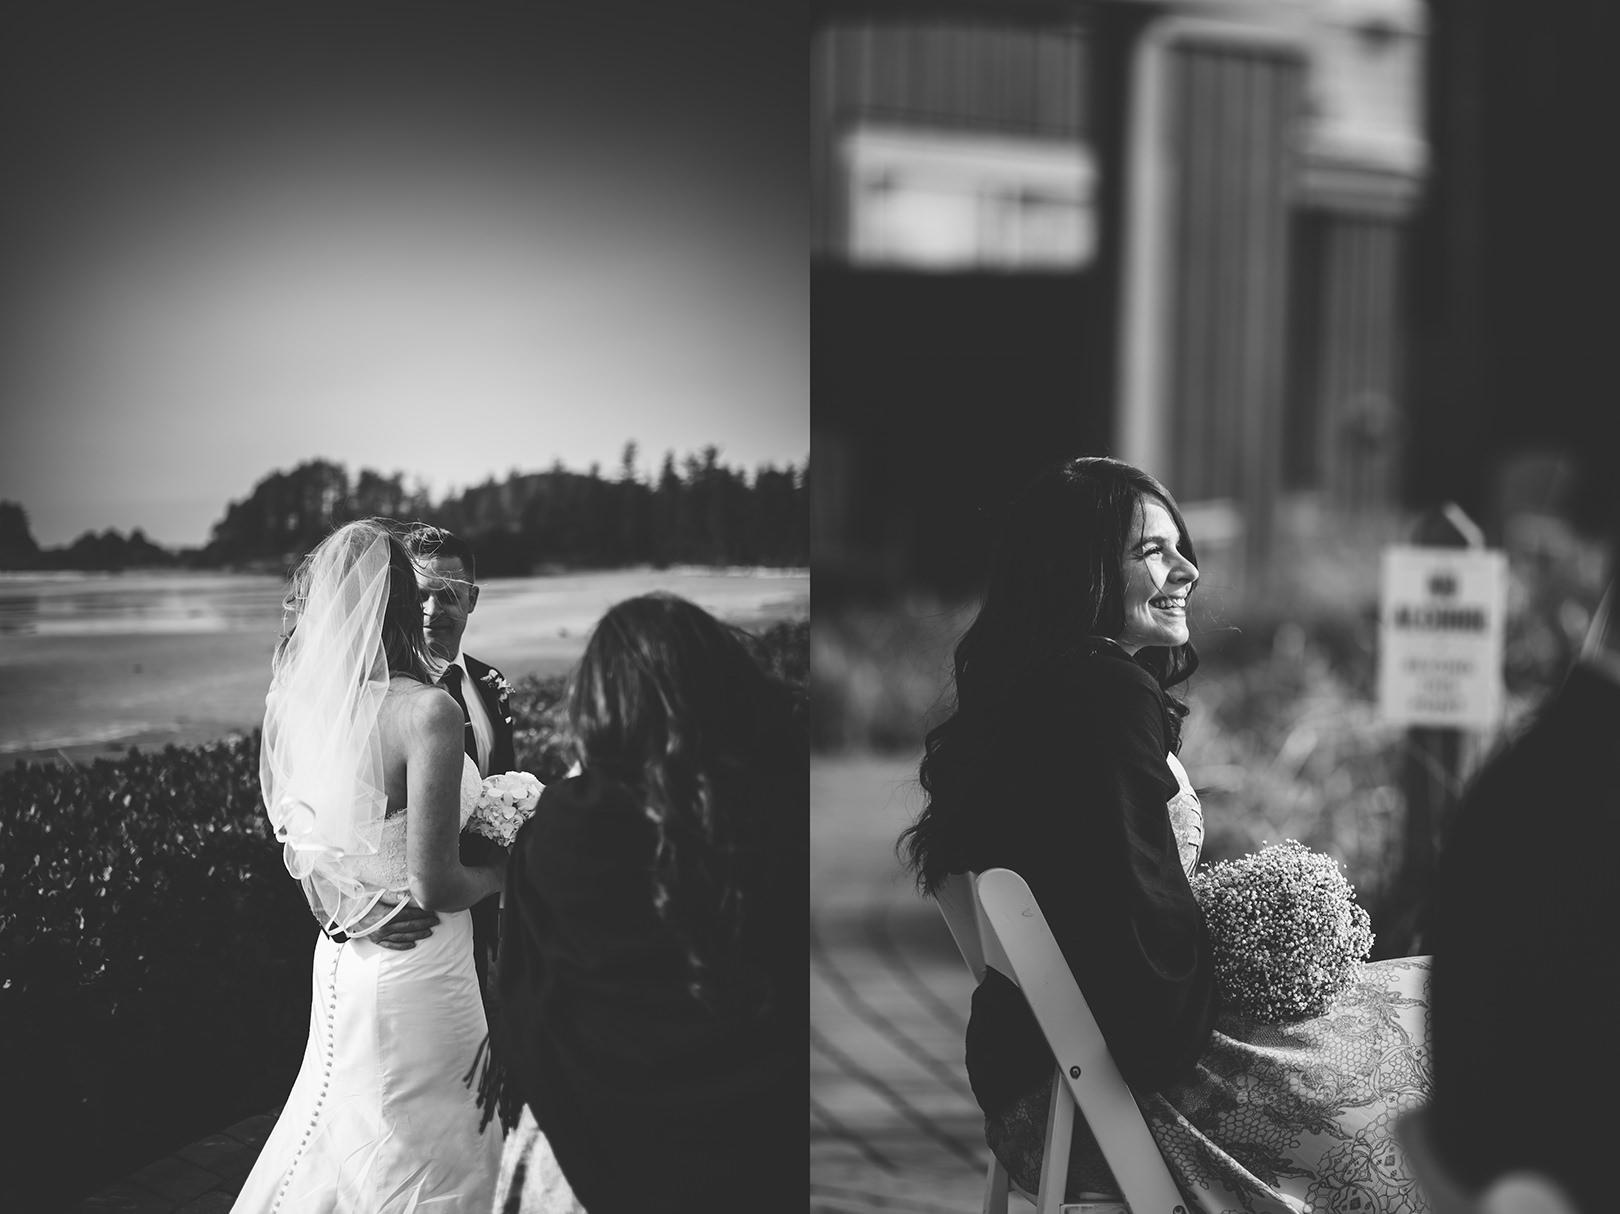 Justin & Trish - © Dallas Kolotylo Photography - Online Gallery - 113b